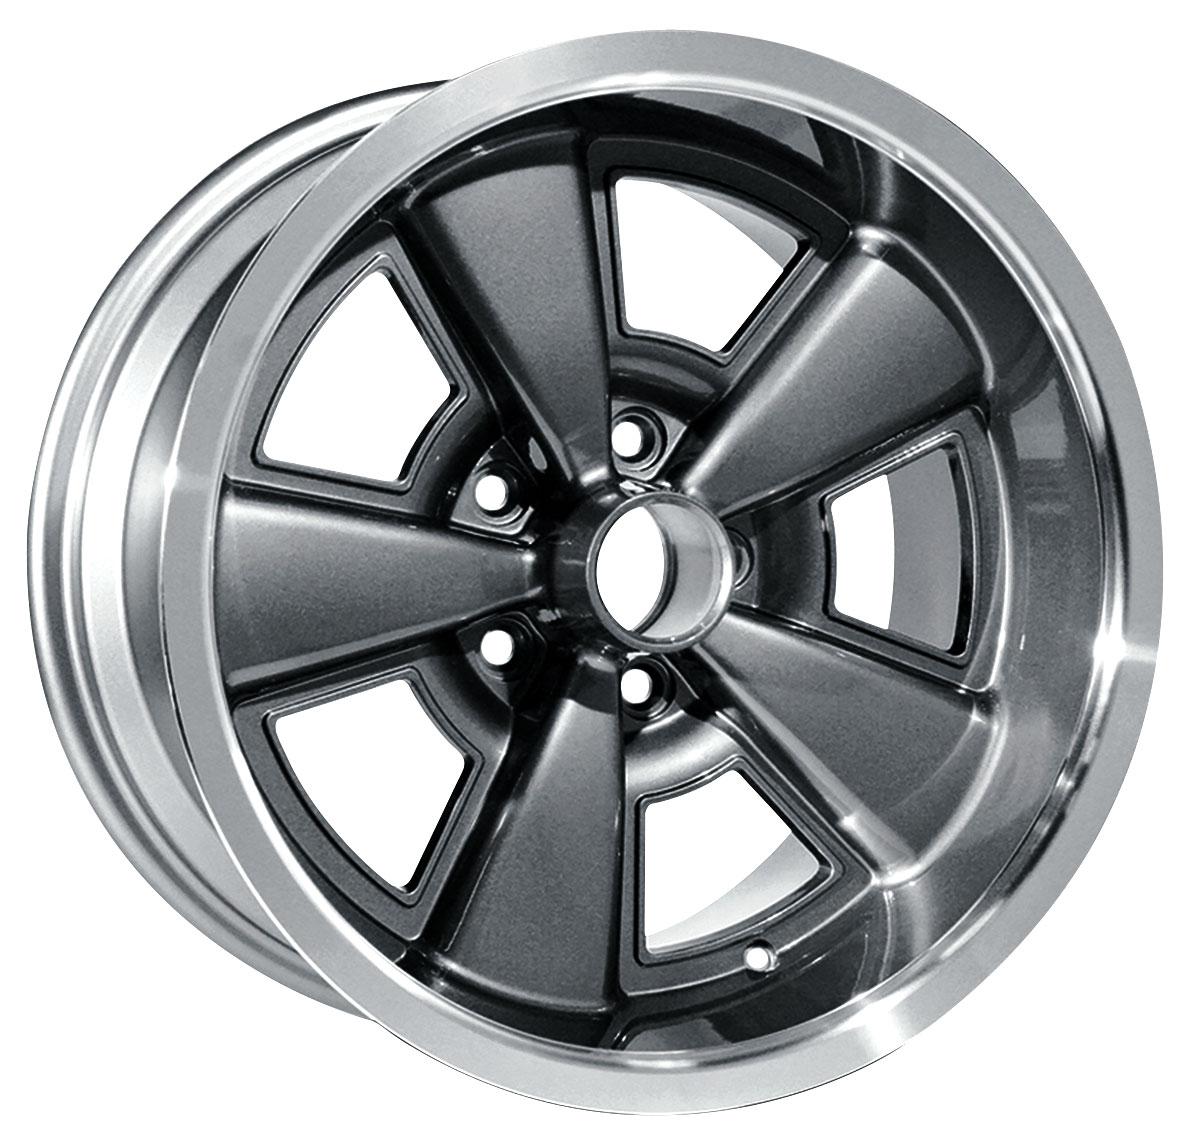 "Aluminum Rally Wheel, 1971-72 CH/EC/MC, Gunmetal, 17x9, 5.125"" B.S."